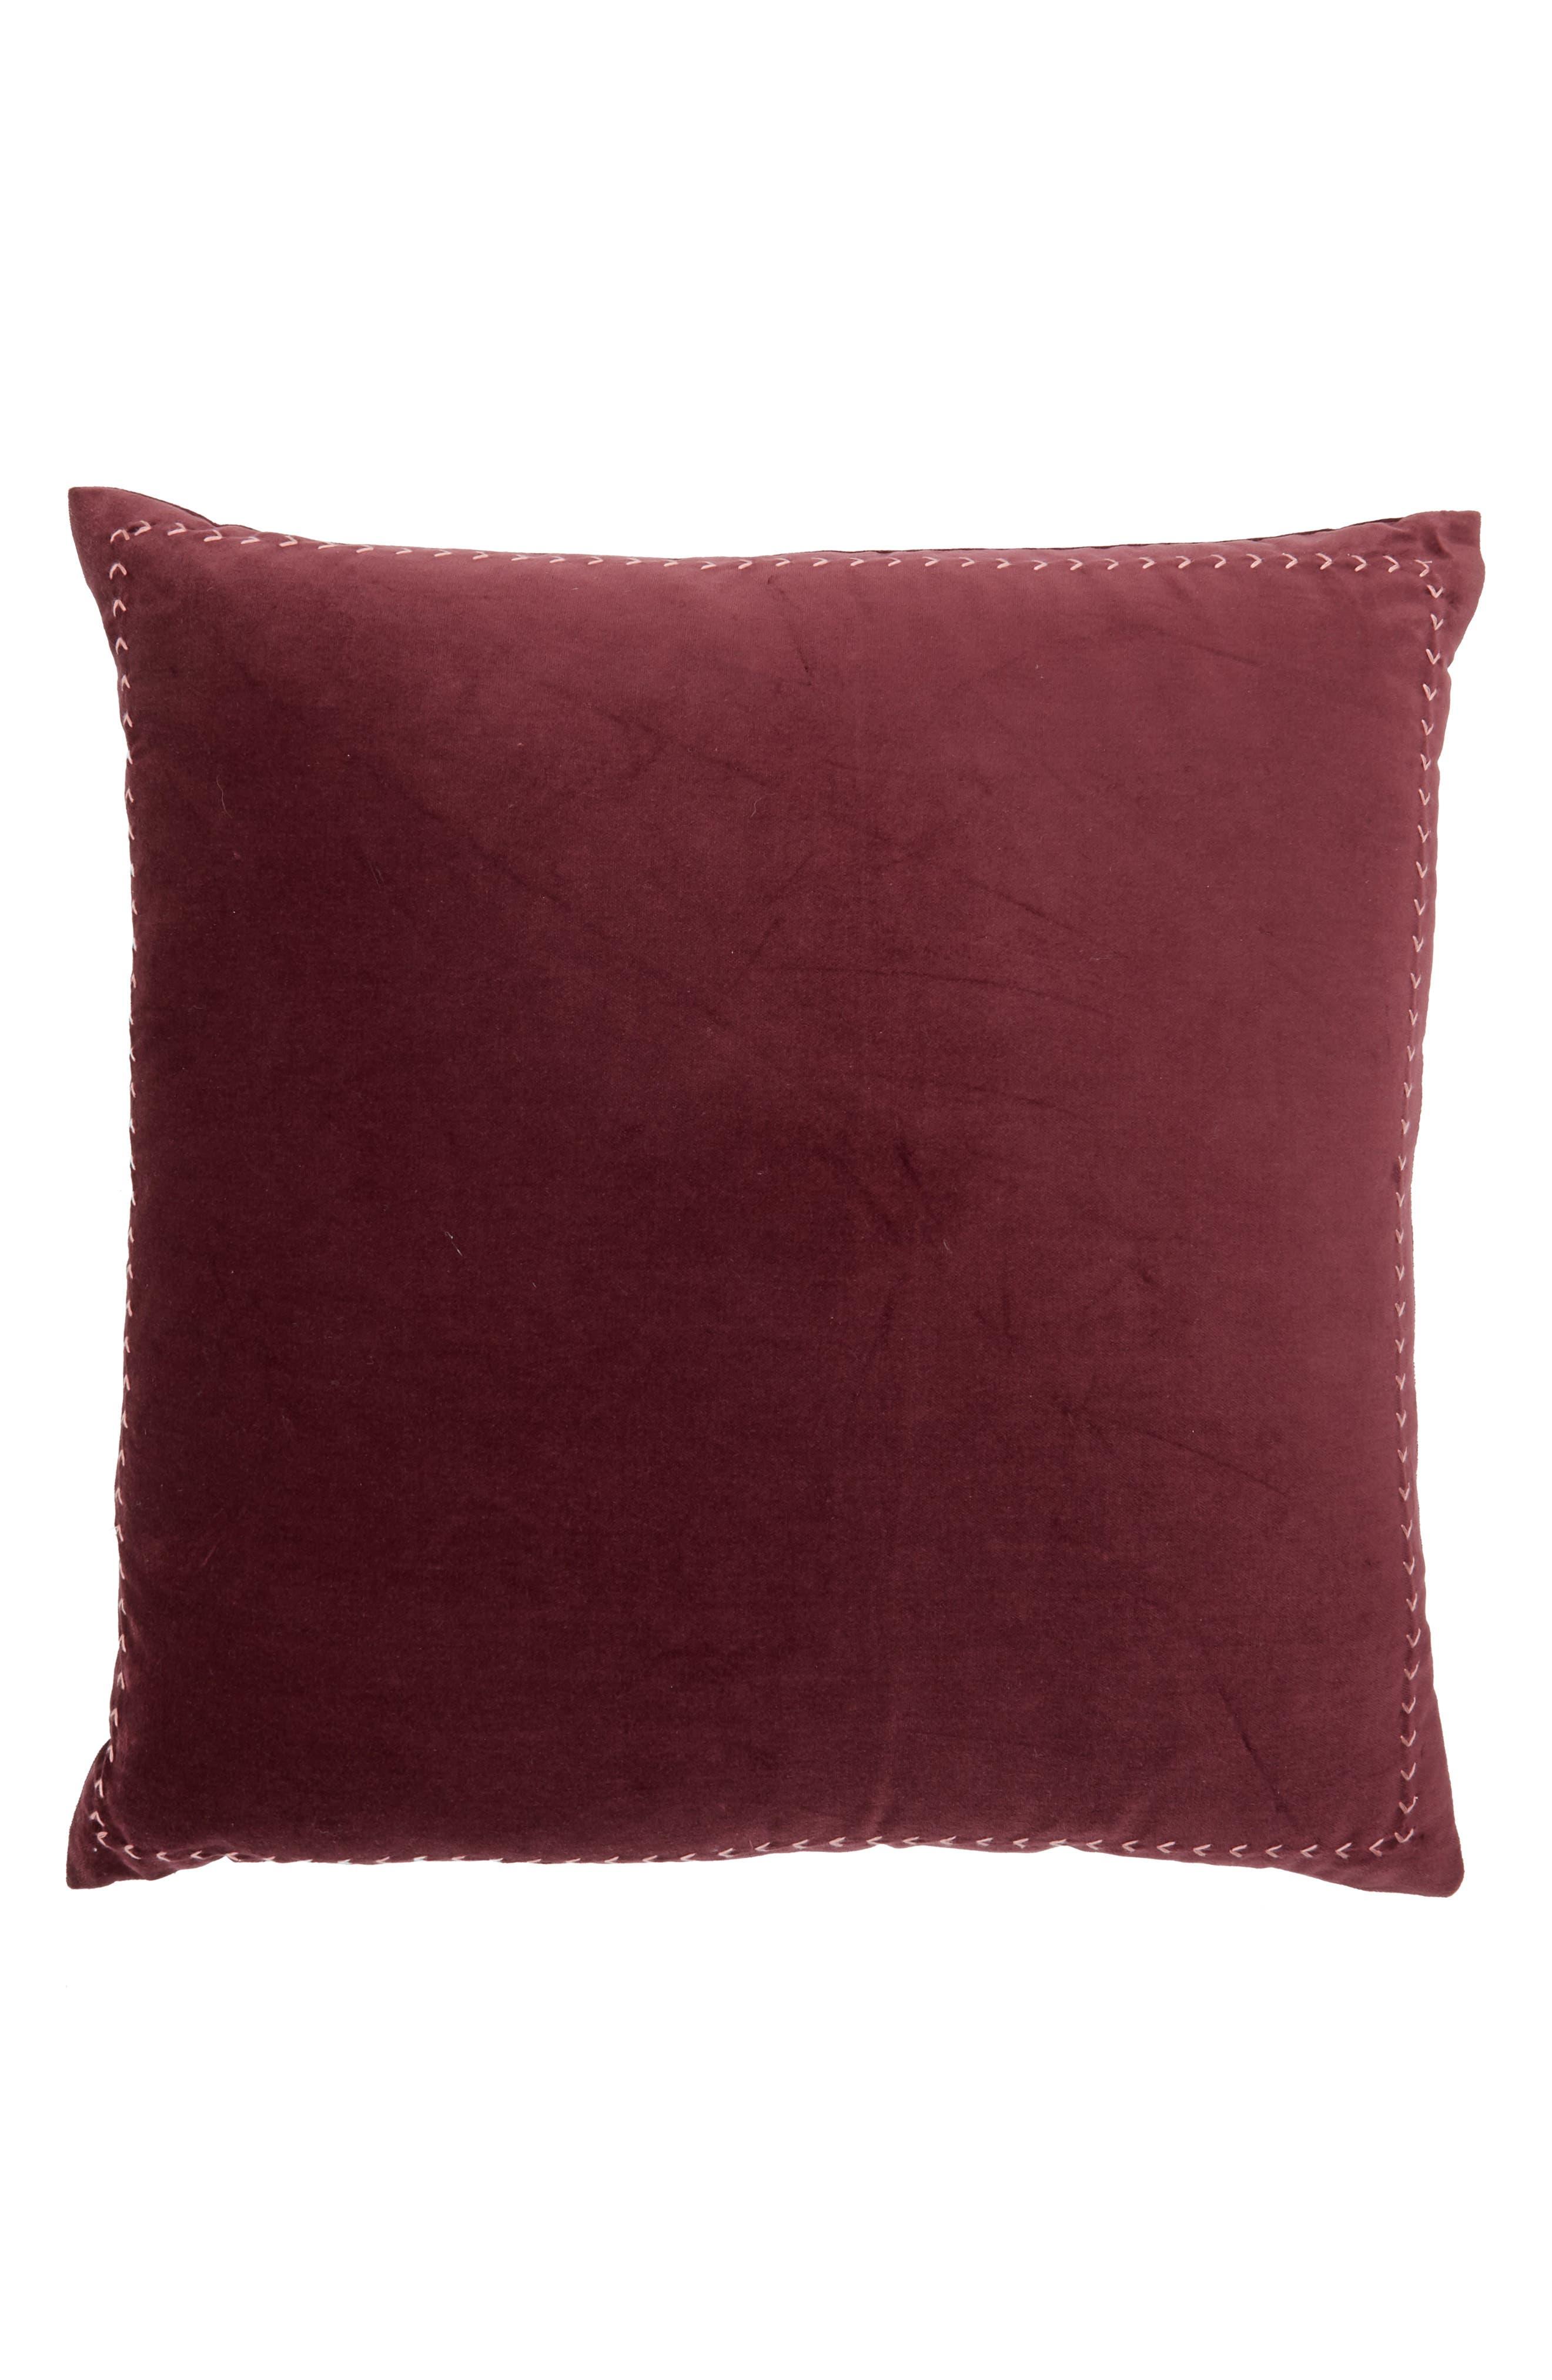 Velvet Accent Pillow,                         Main,                         color, Burgundy